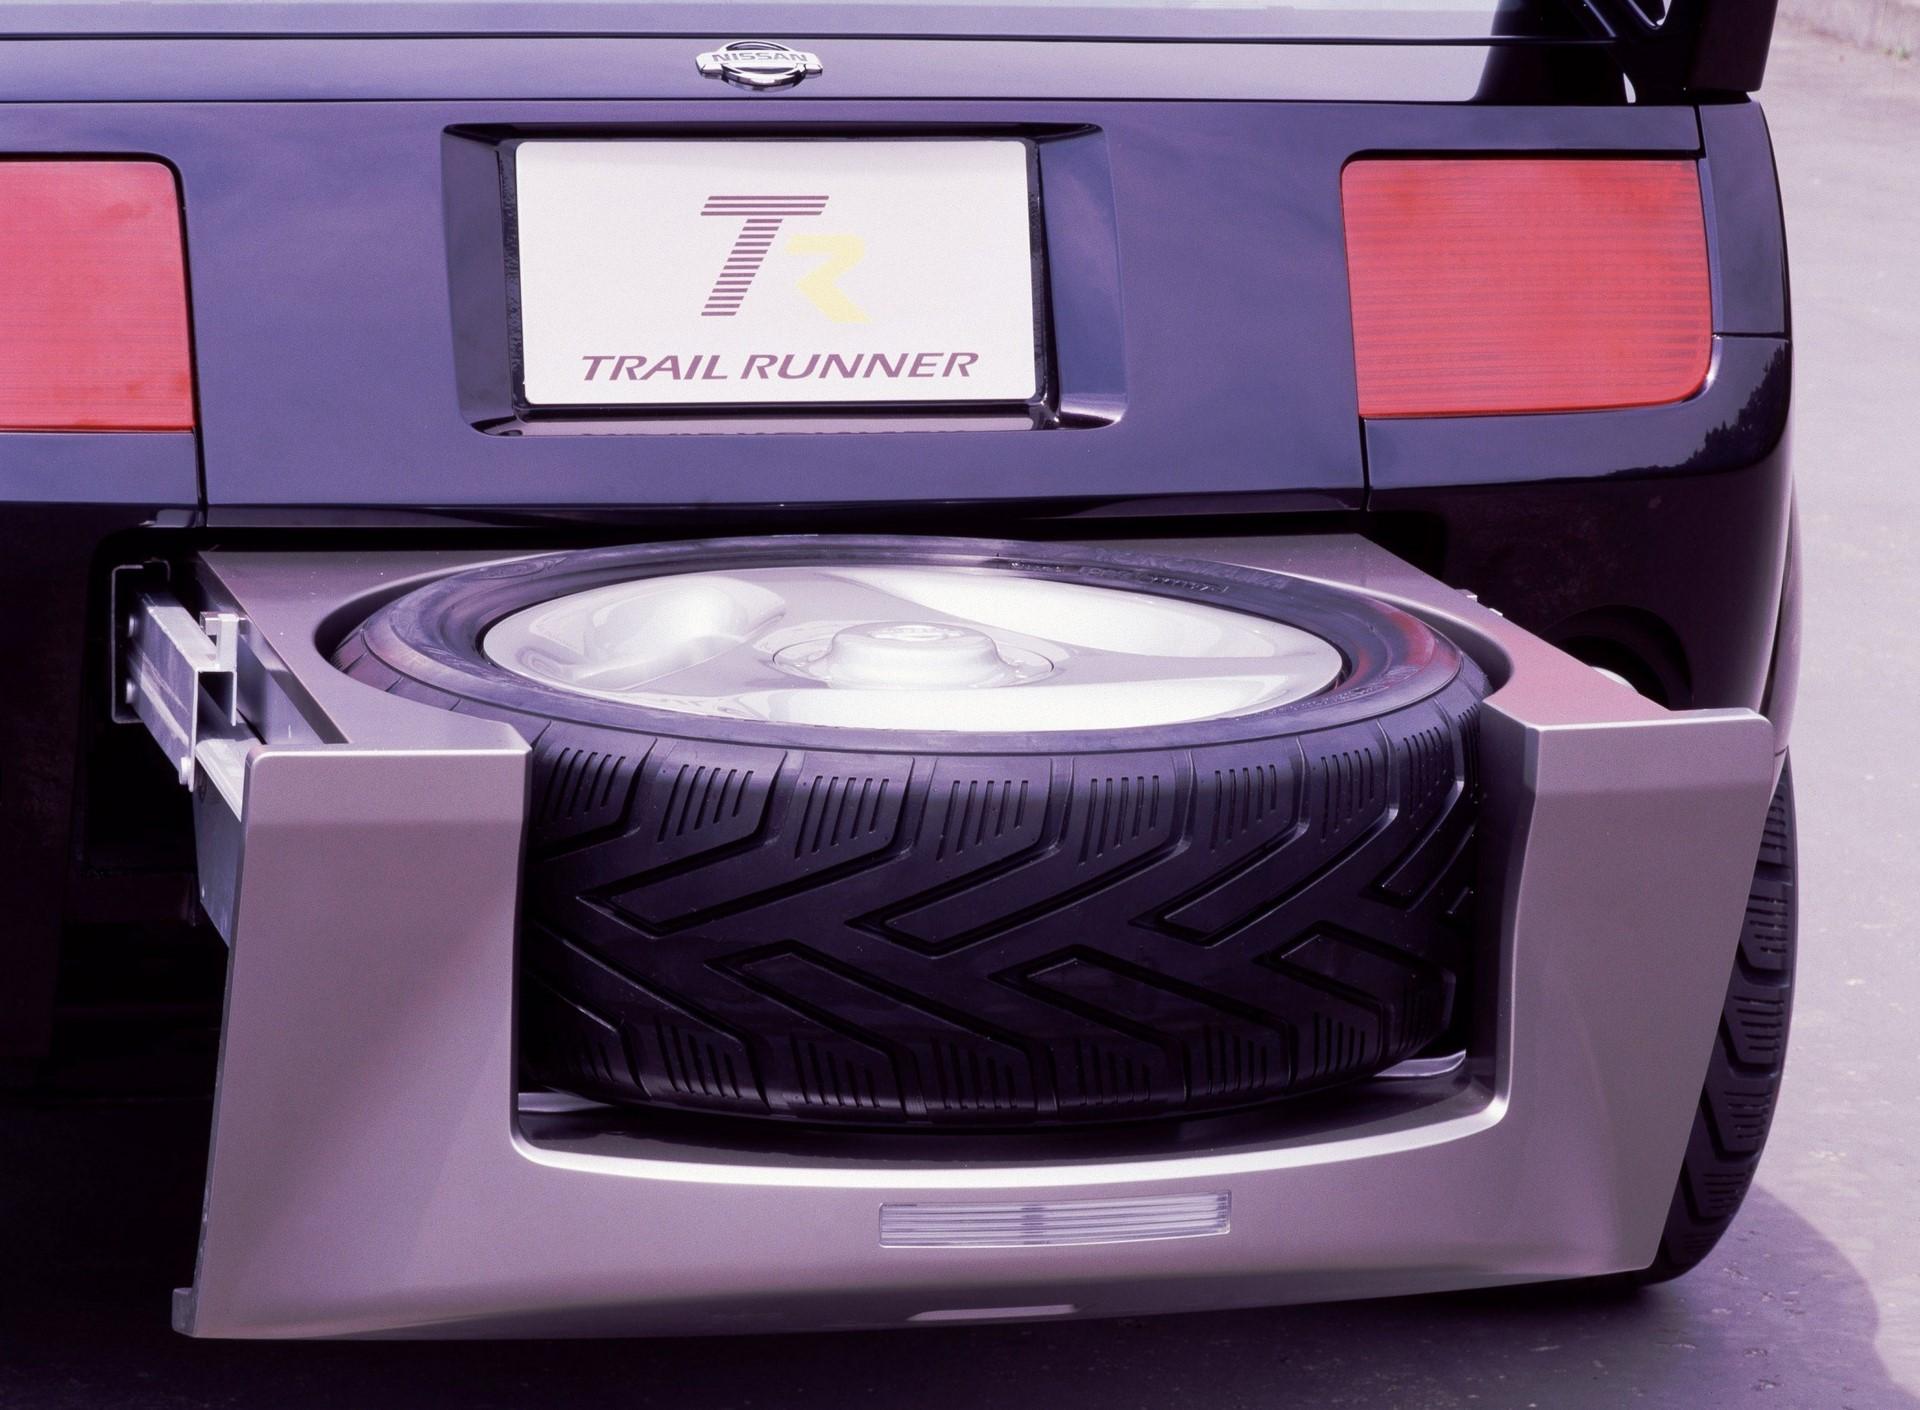 Nissan Trail Runner concept (4)